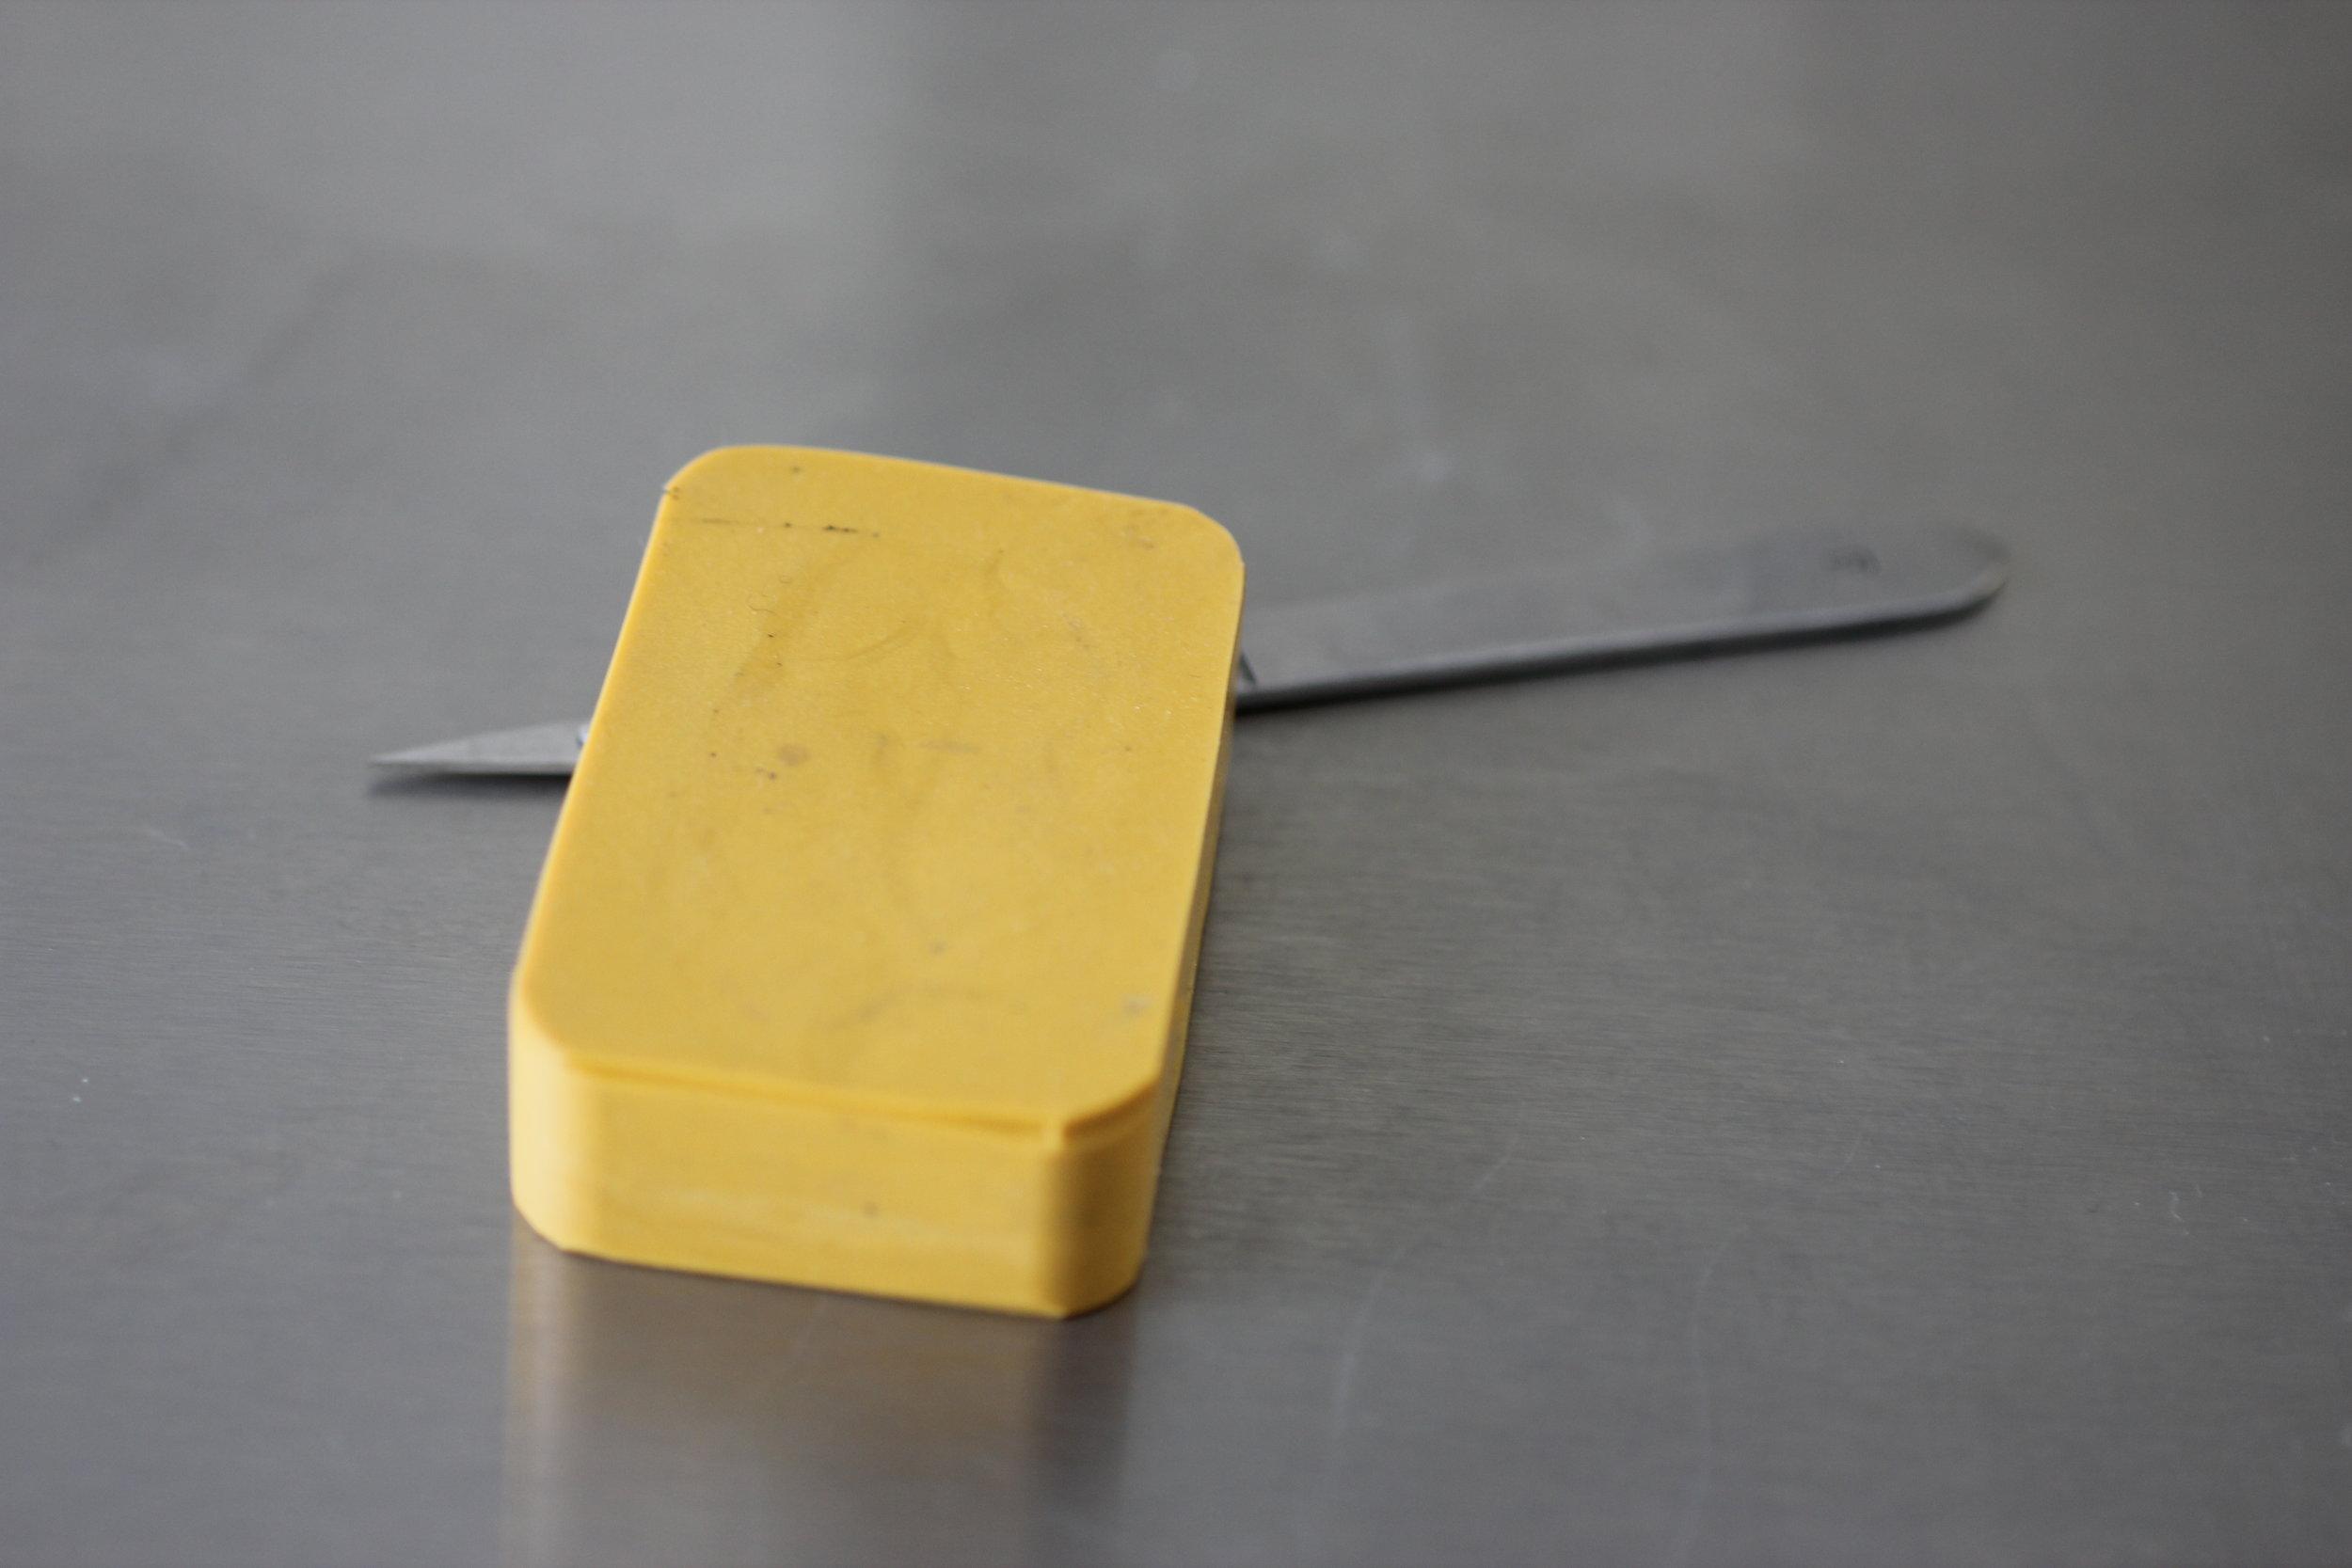 A uncut rubber mould - the master patter hidden inside.